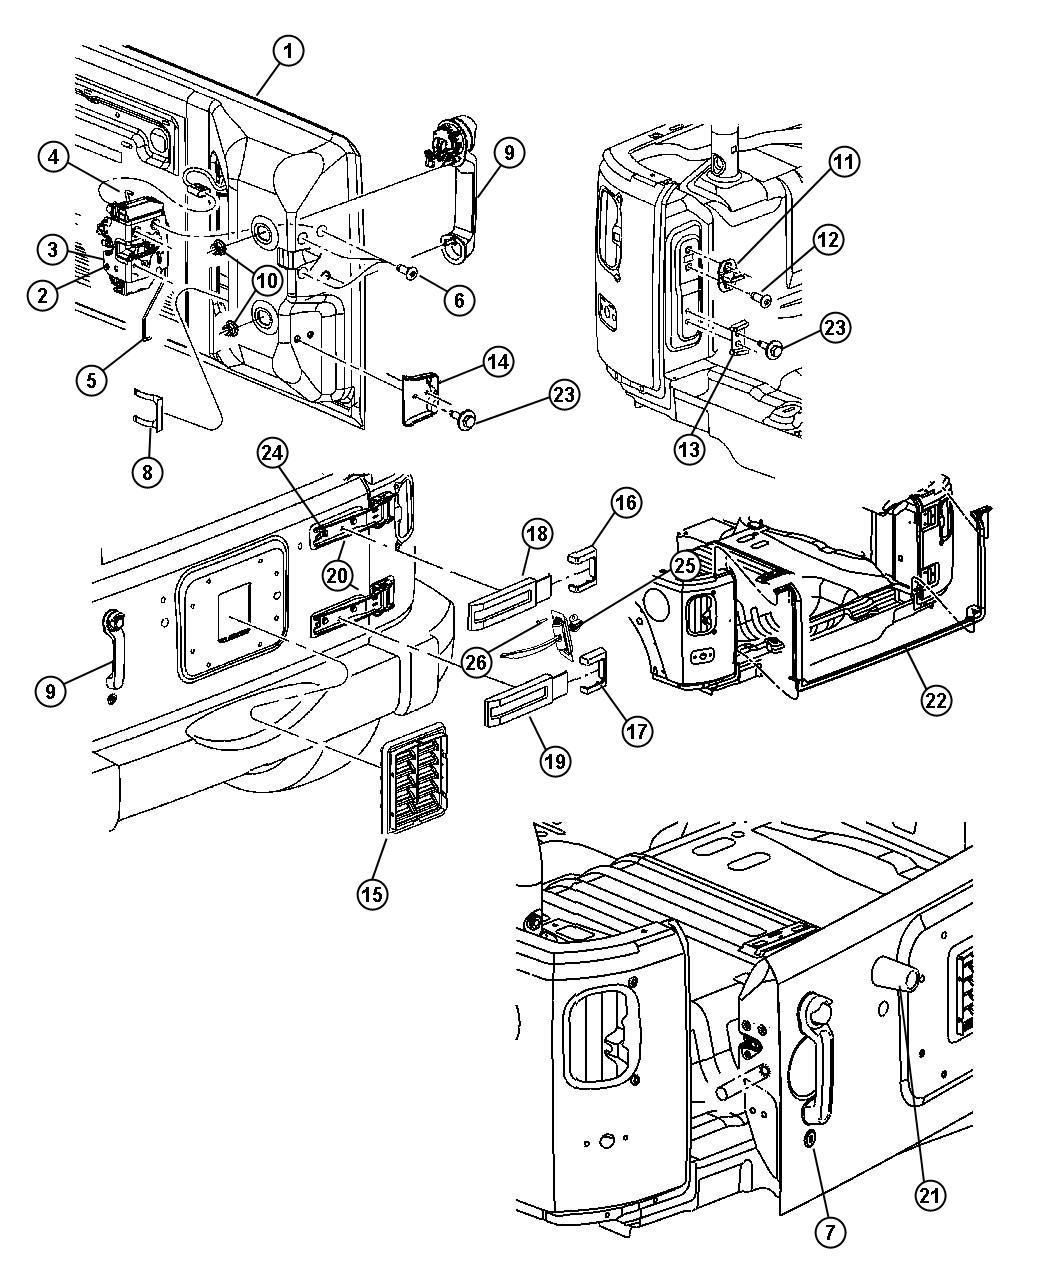 32 Jeep Wrangler Body Parts Diagram